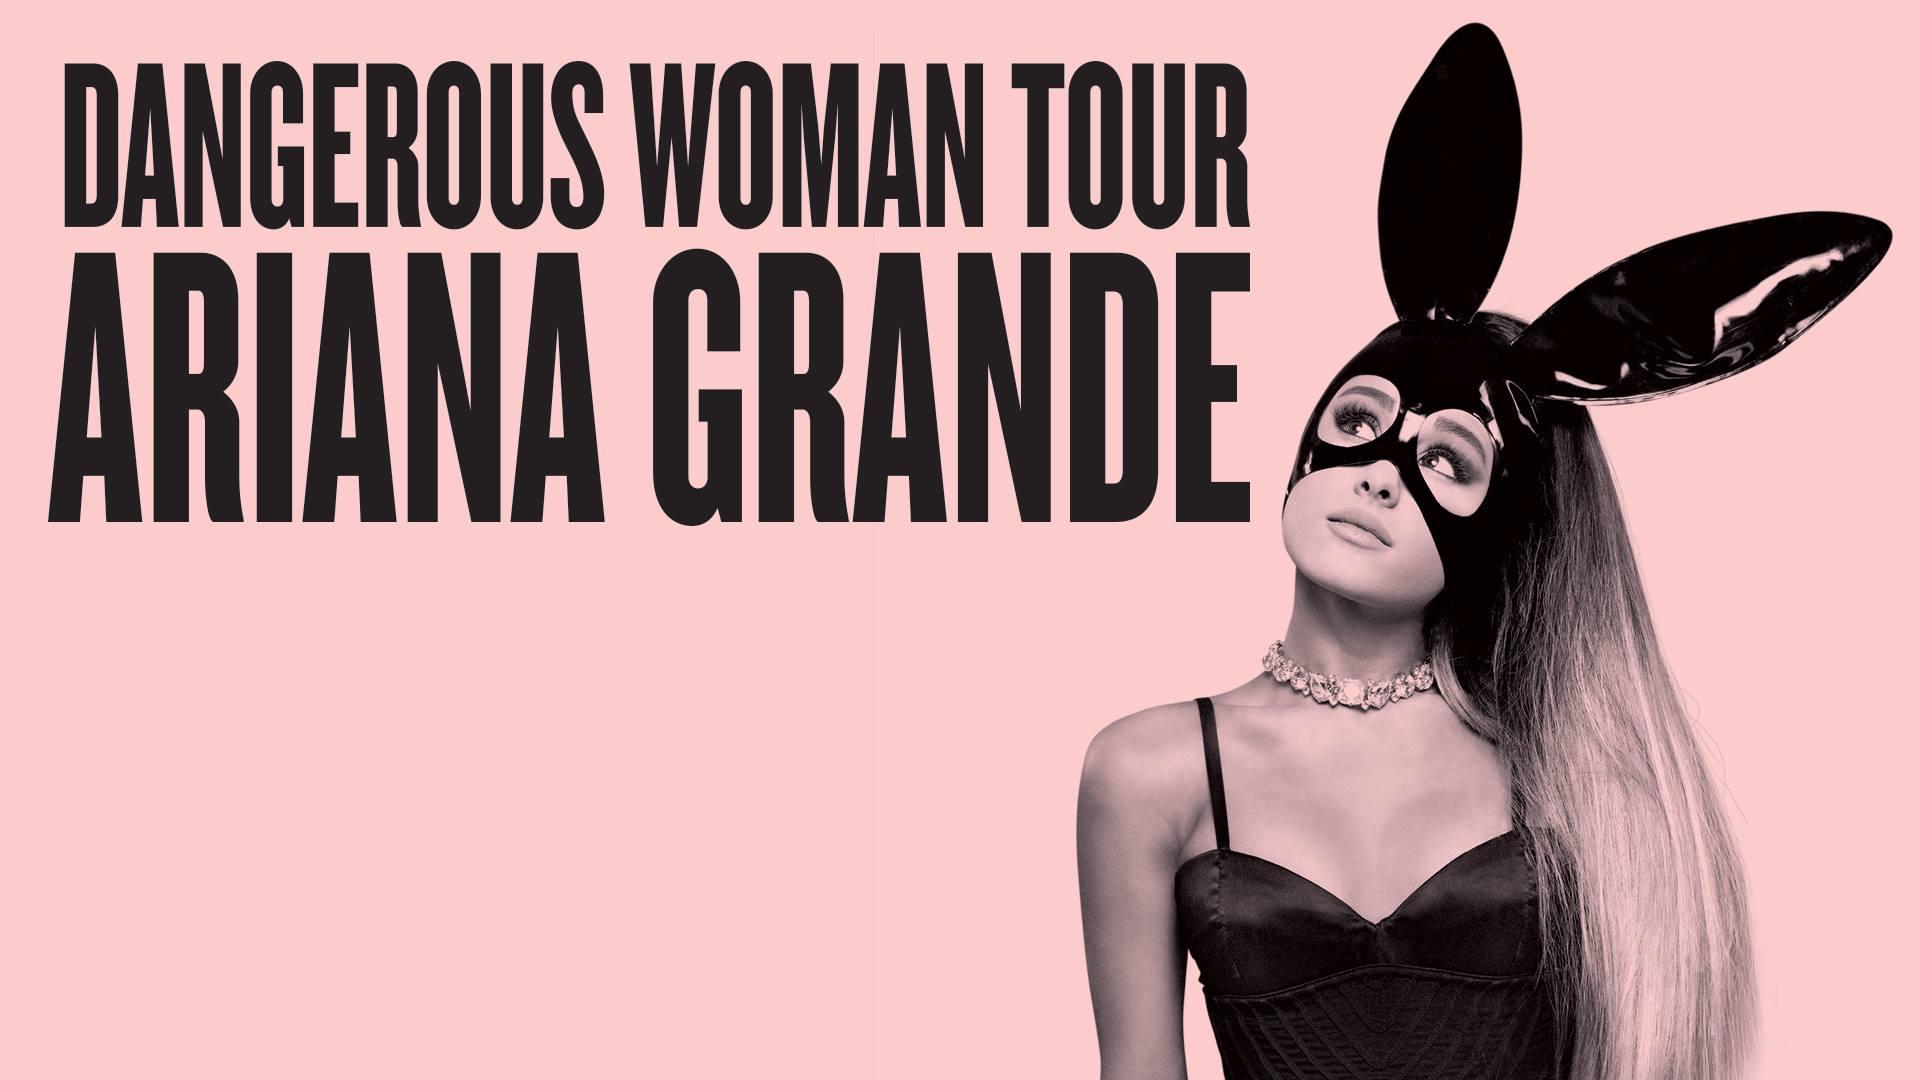 Ariana Grande Tour Banner